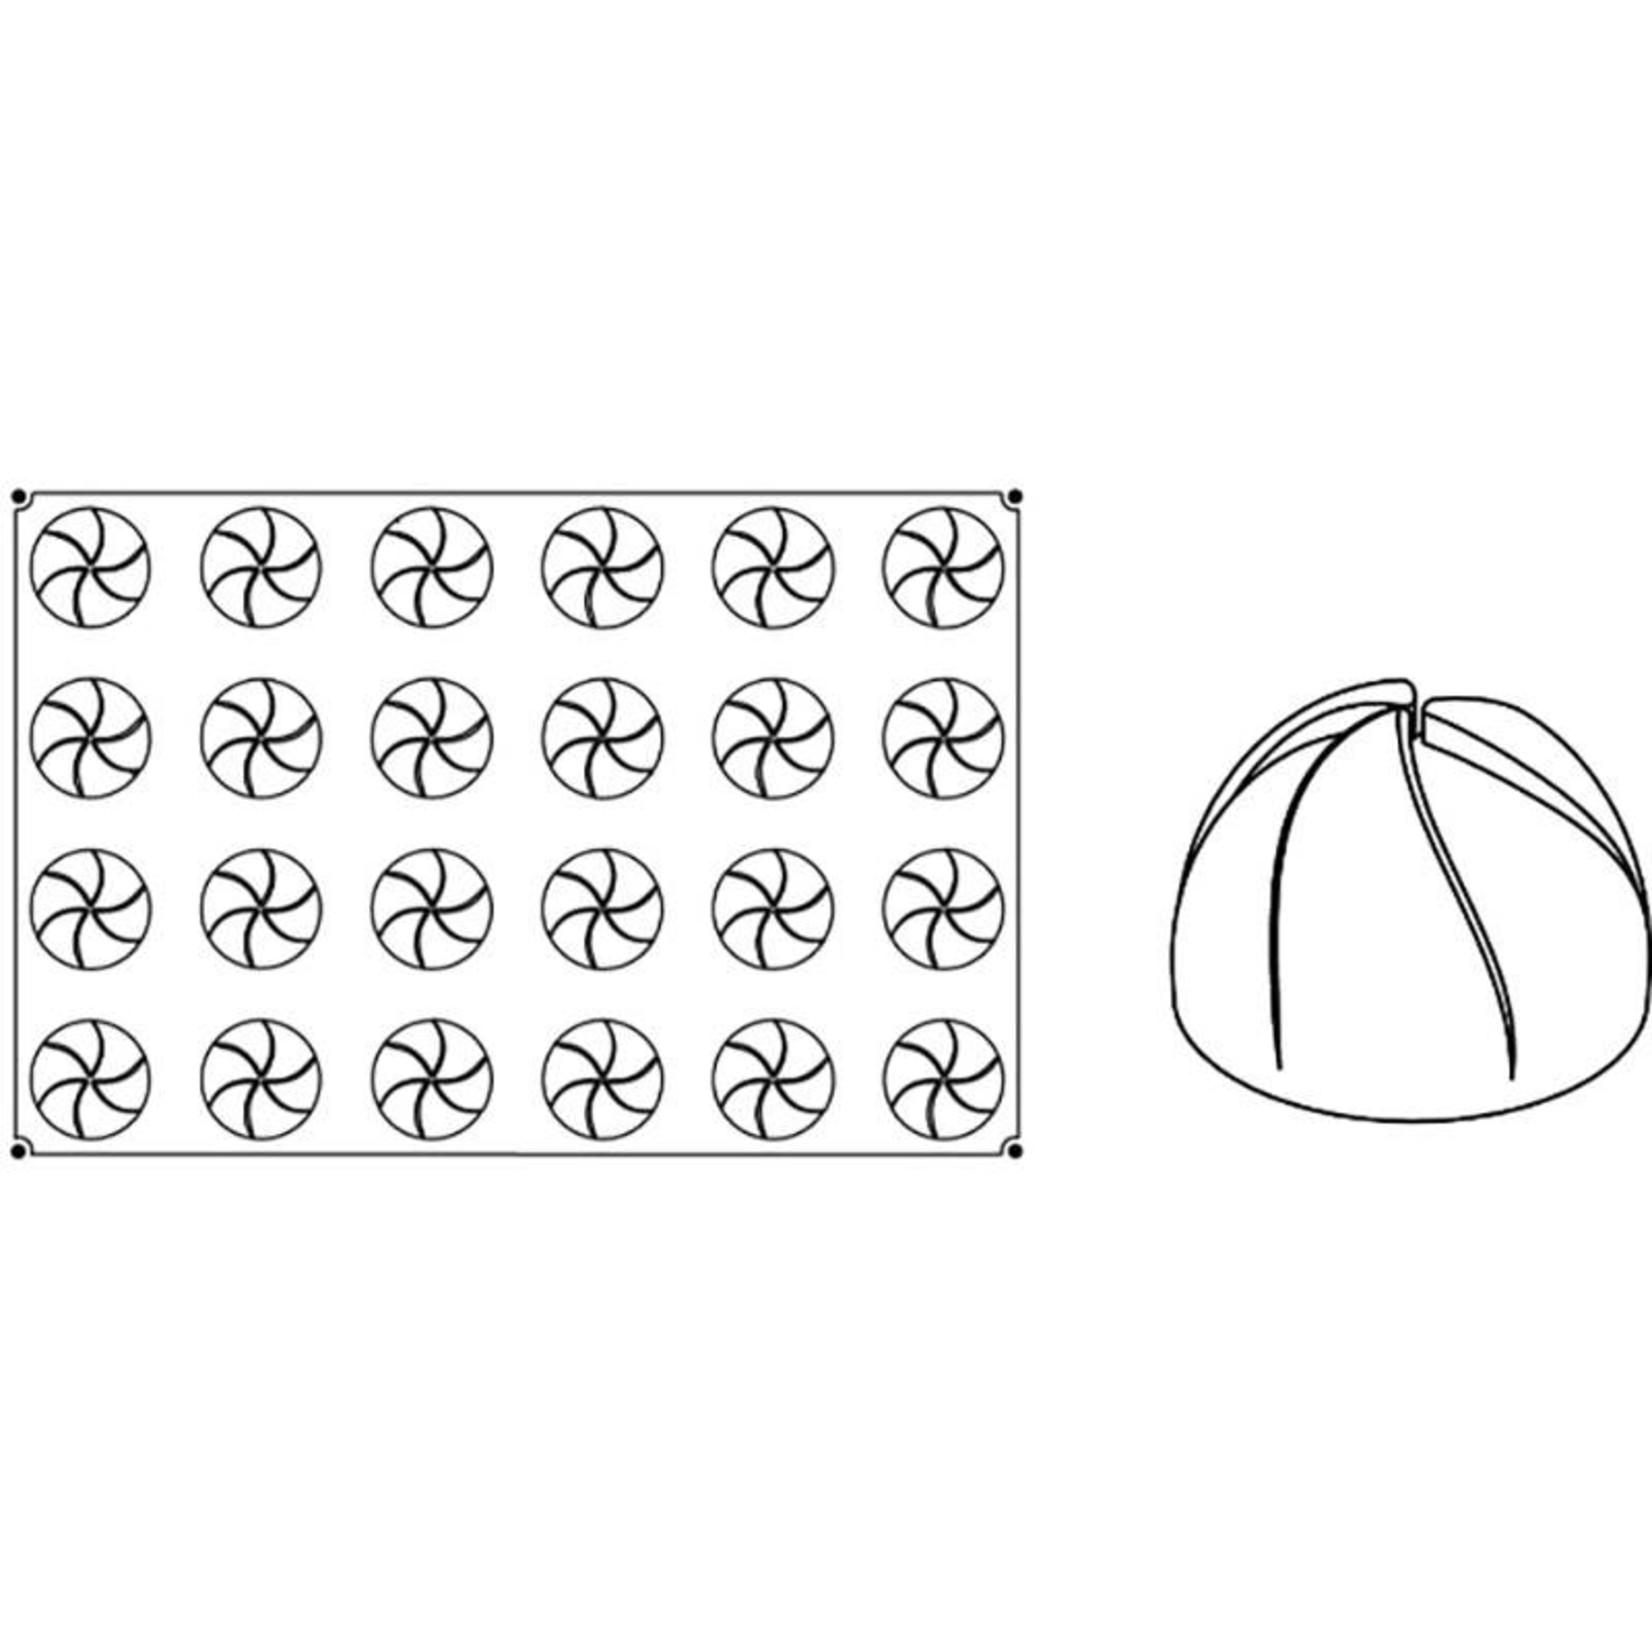 Pavoni Pavoni - Pavoflex silicone mold, Vertigo, Monoporzione (24 cavity), PX033